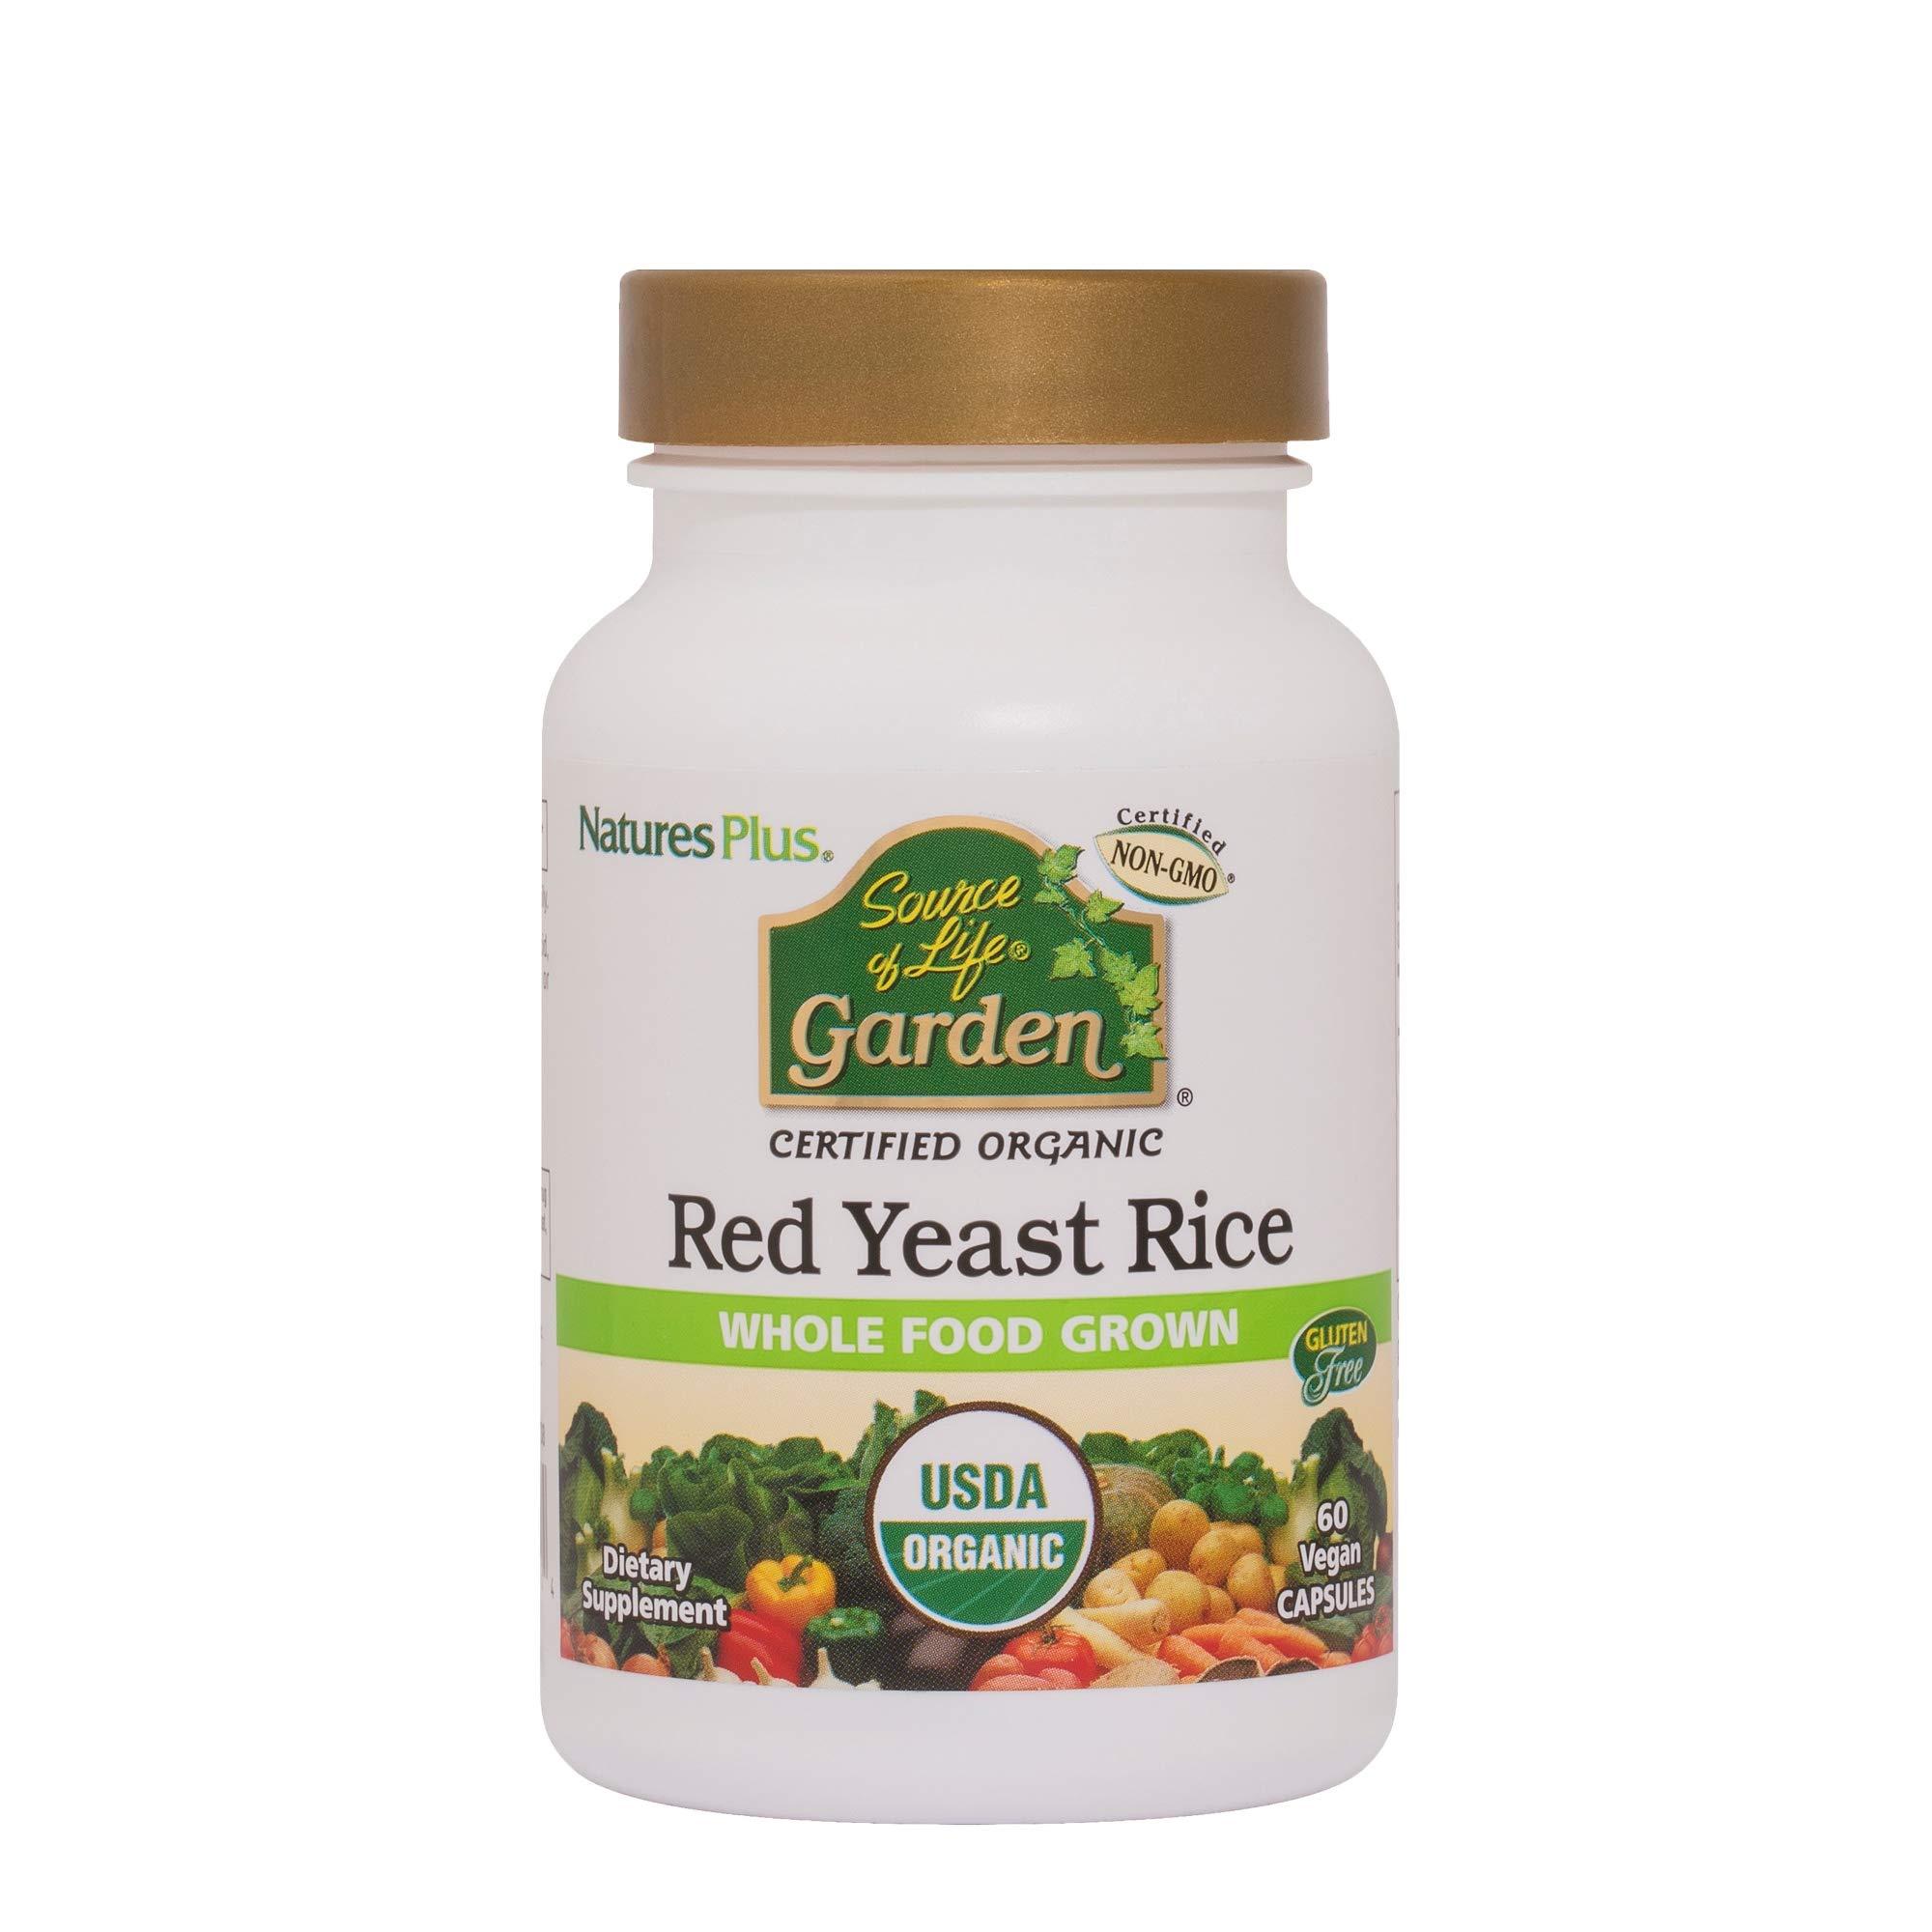 Natures Plus Source of Life Garden Red Yeast Rice - 600 mg, 2.5% Monacolins, 60 Vegan Tablets - USDA Certified Organic Herbal Supplement - Vegetarian, Gluten Free - 60 Servings